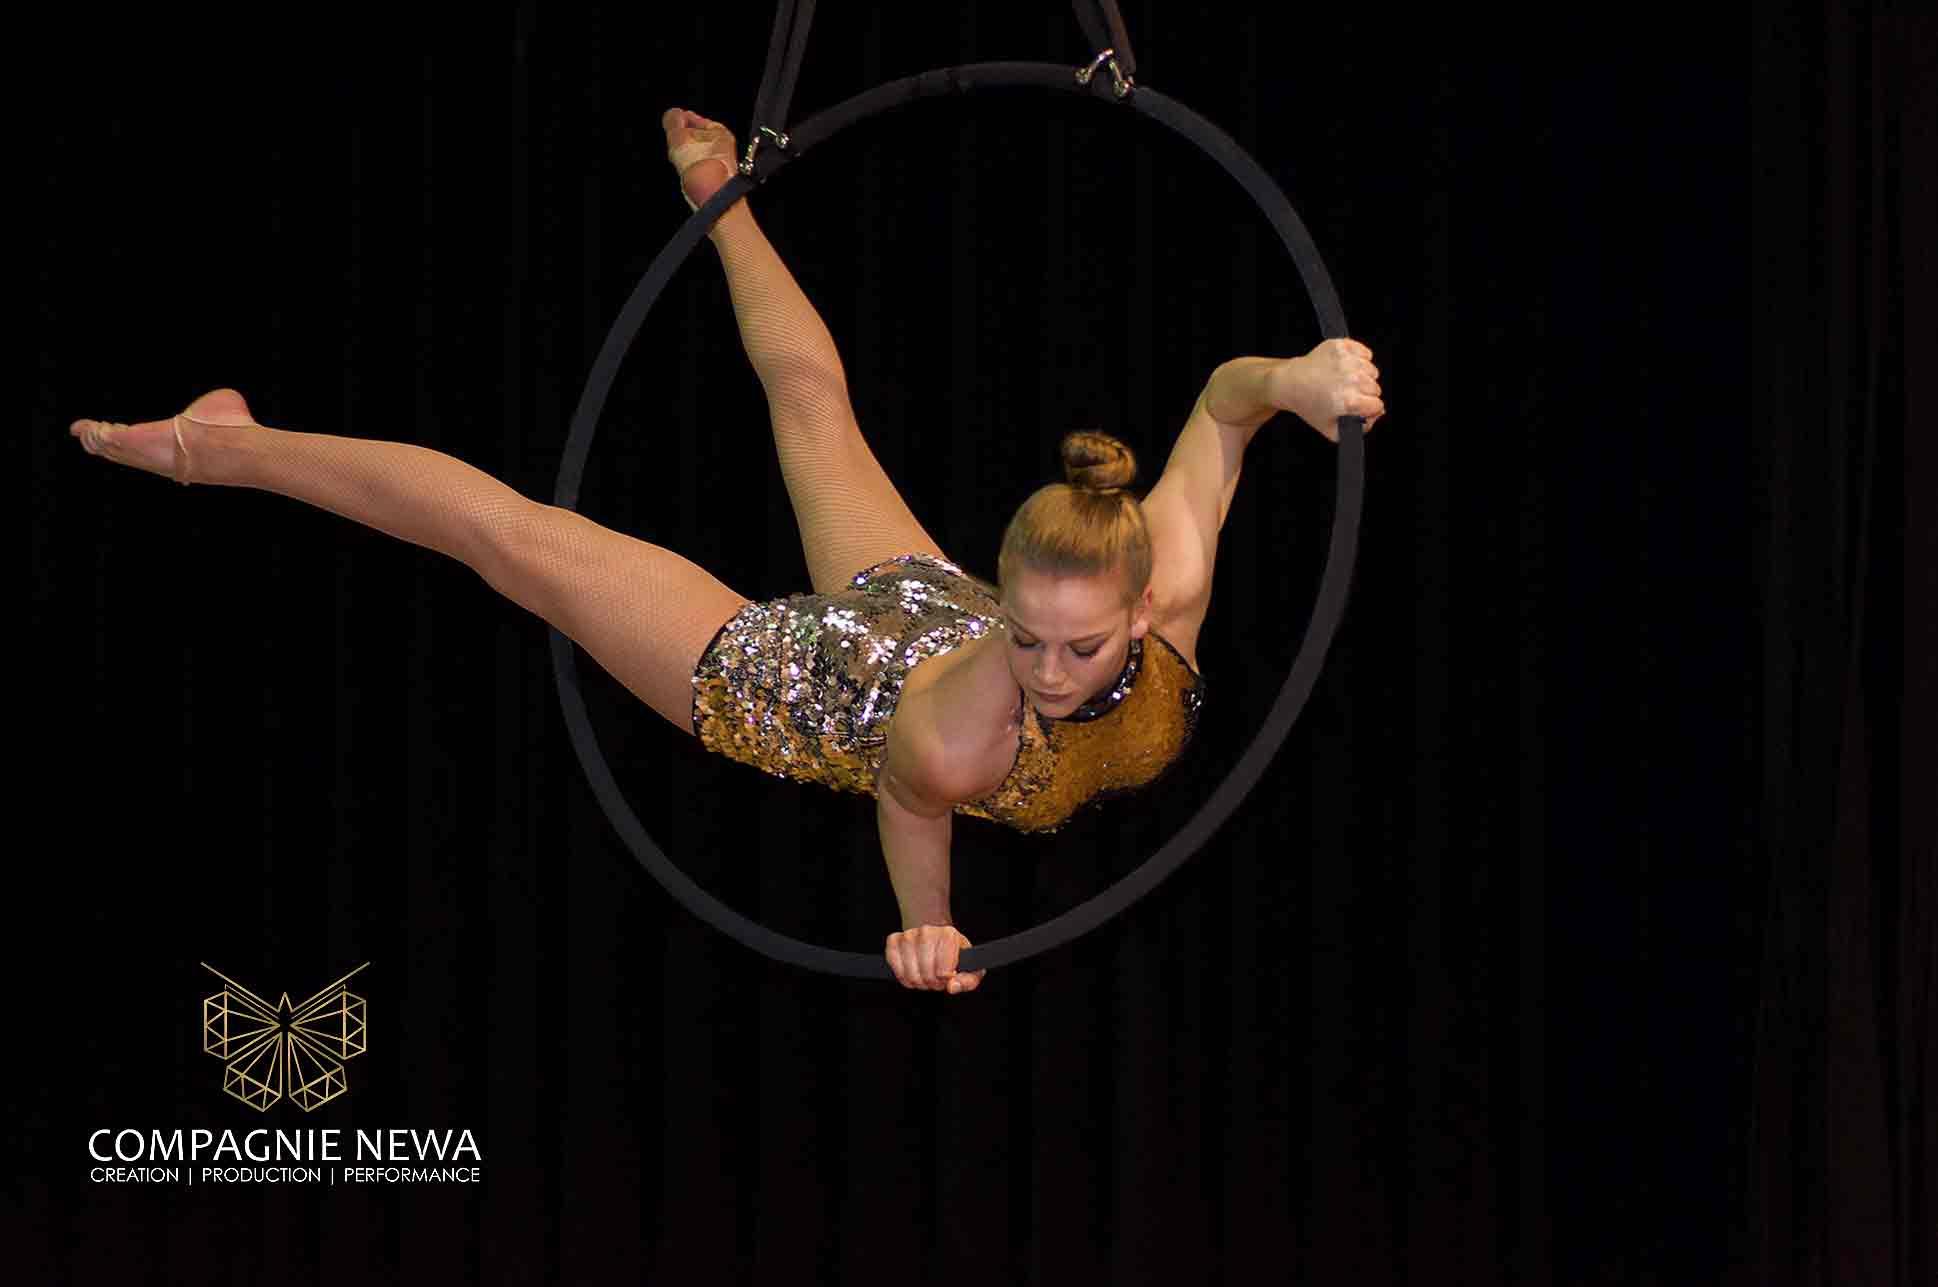 newa_aerials_luchtacrobatiek_ring_hoop